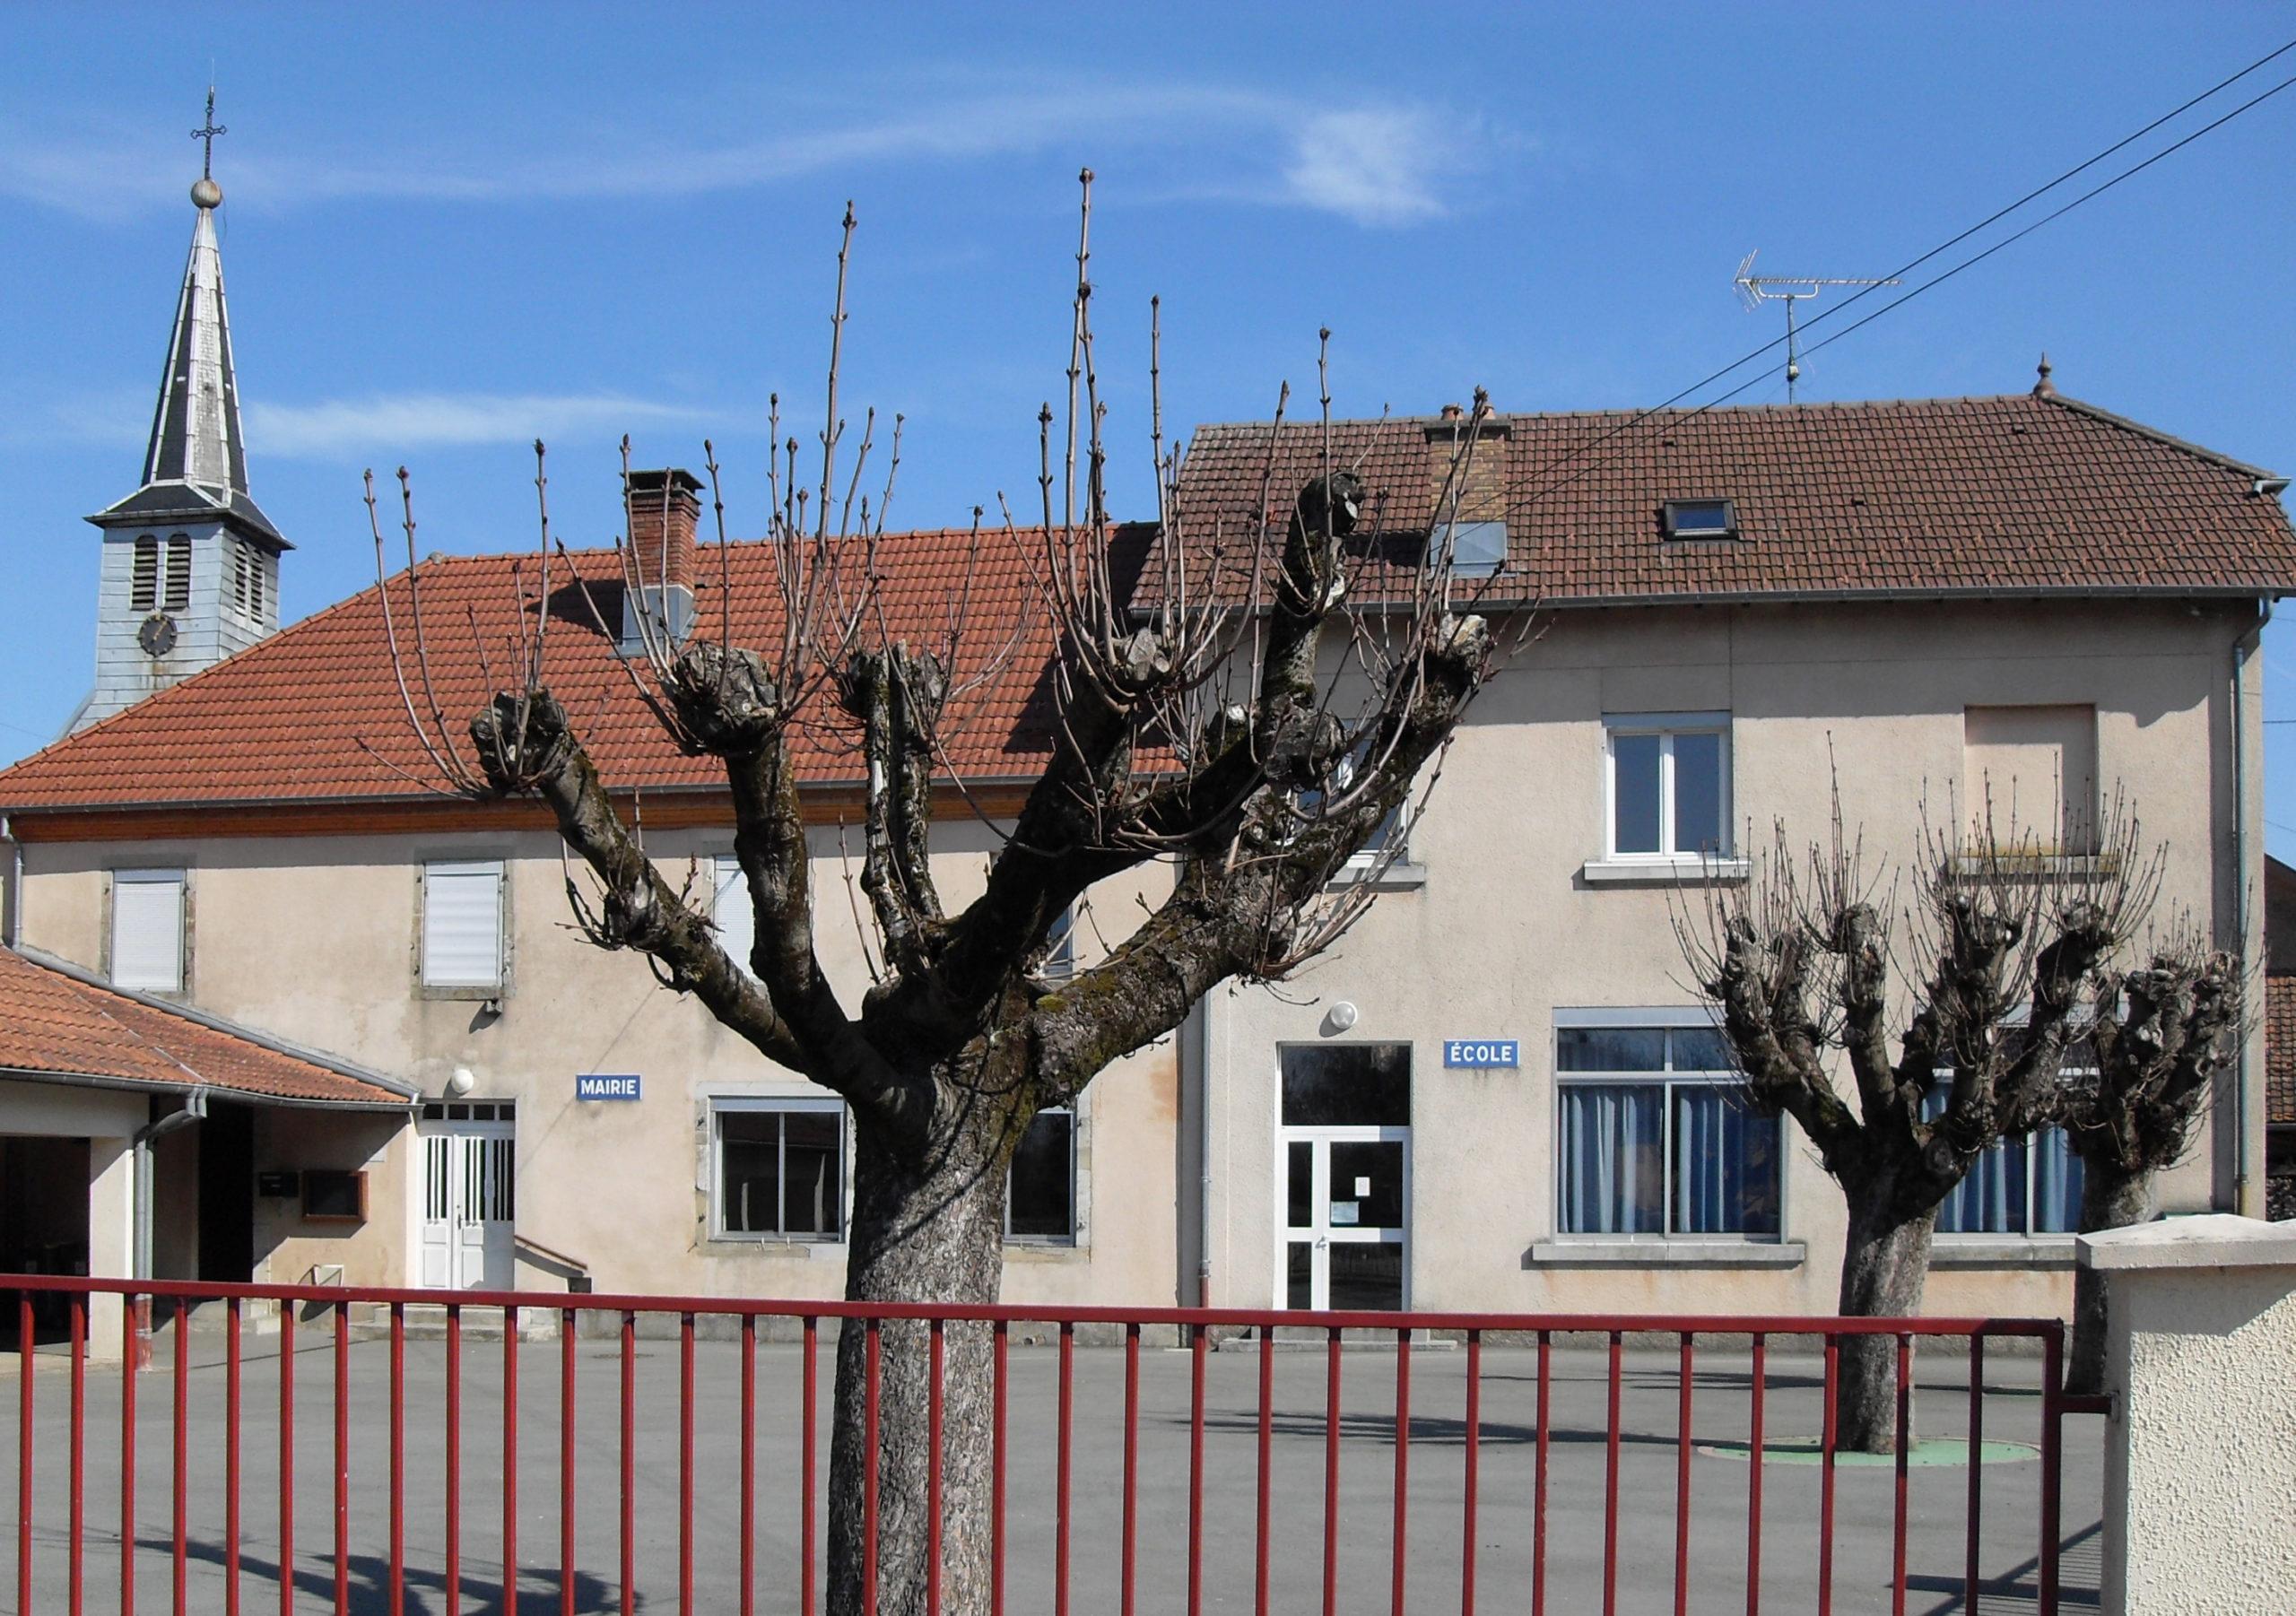 Froidefontaine,_Mairie_et_École